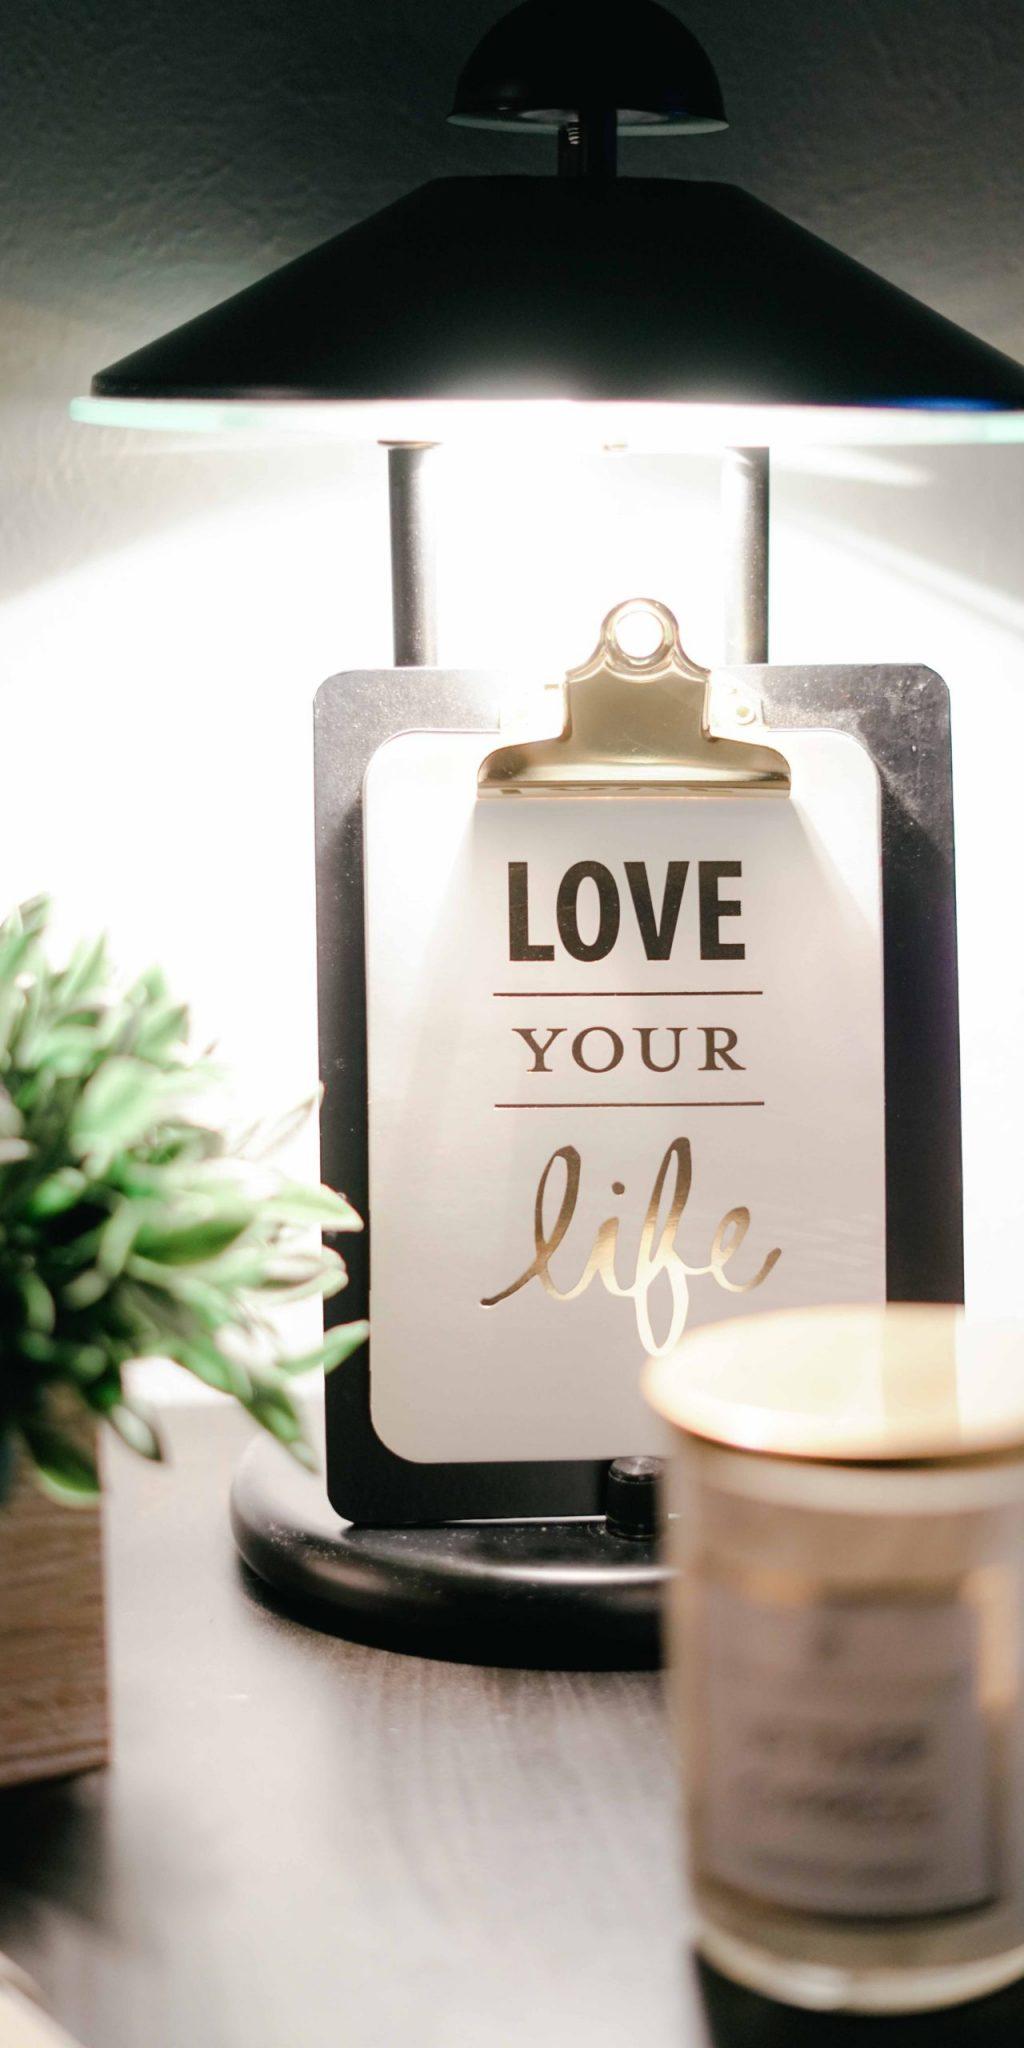 love-your-life-clipboard-decor-811575-scaled-1.jpg